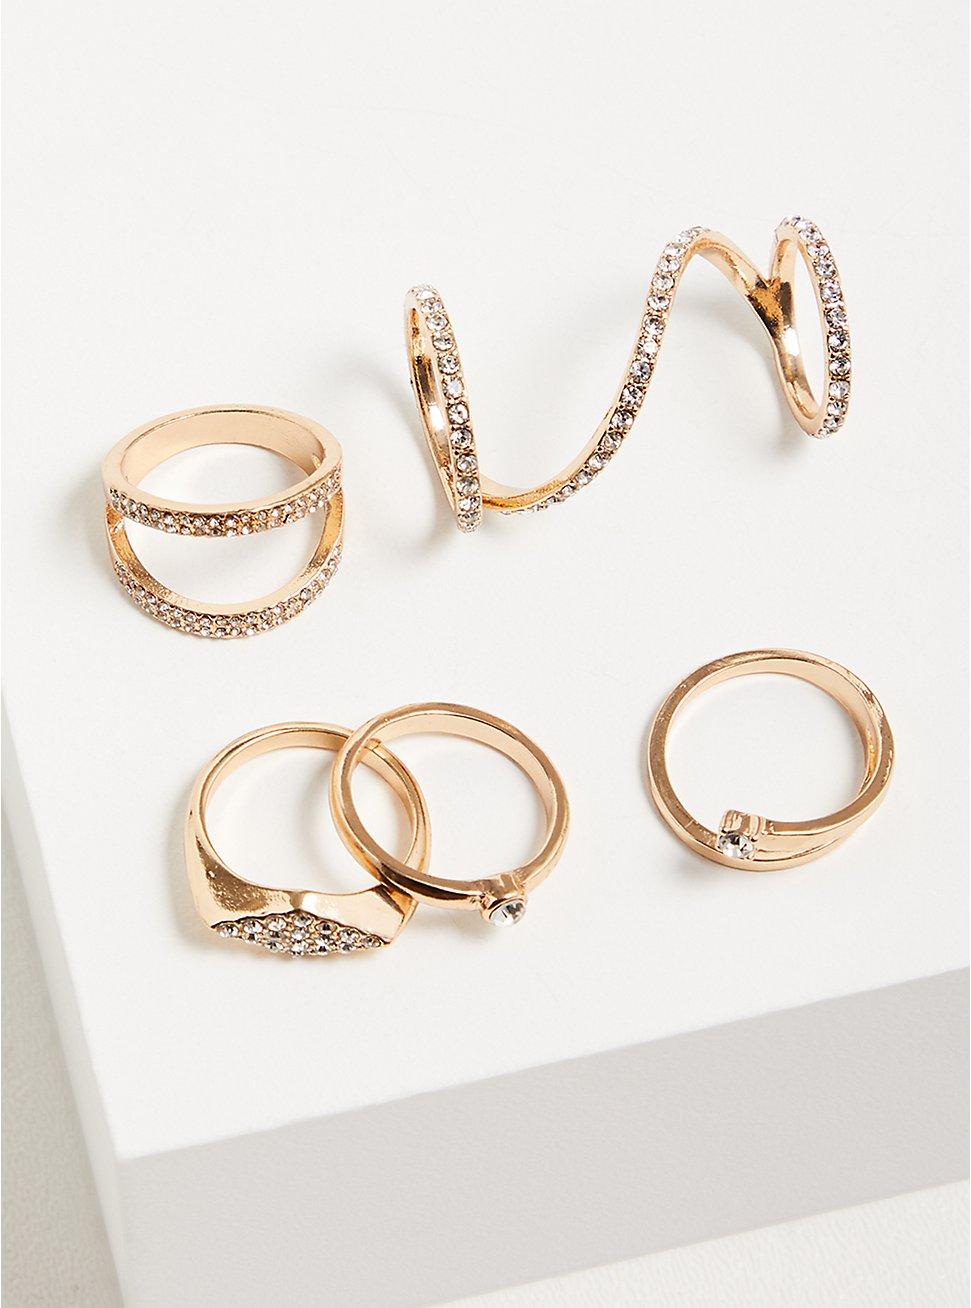 Pave Spiral Ring Set of 5 - Gold Tone, GOLD, hi-res